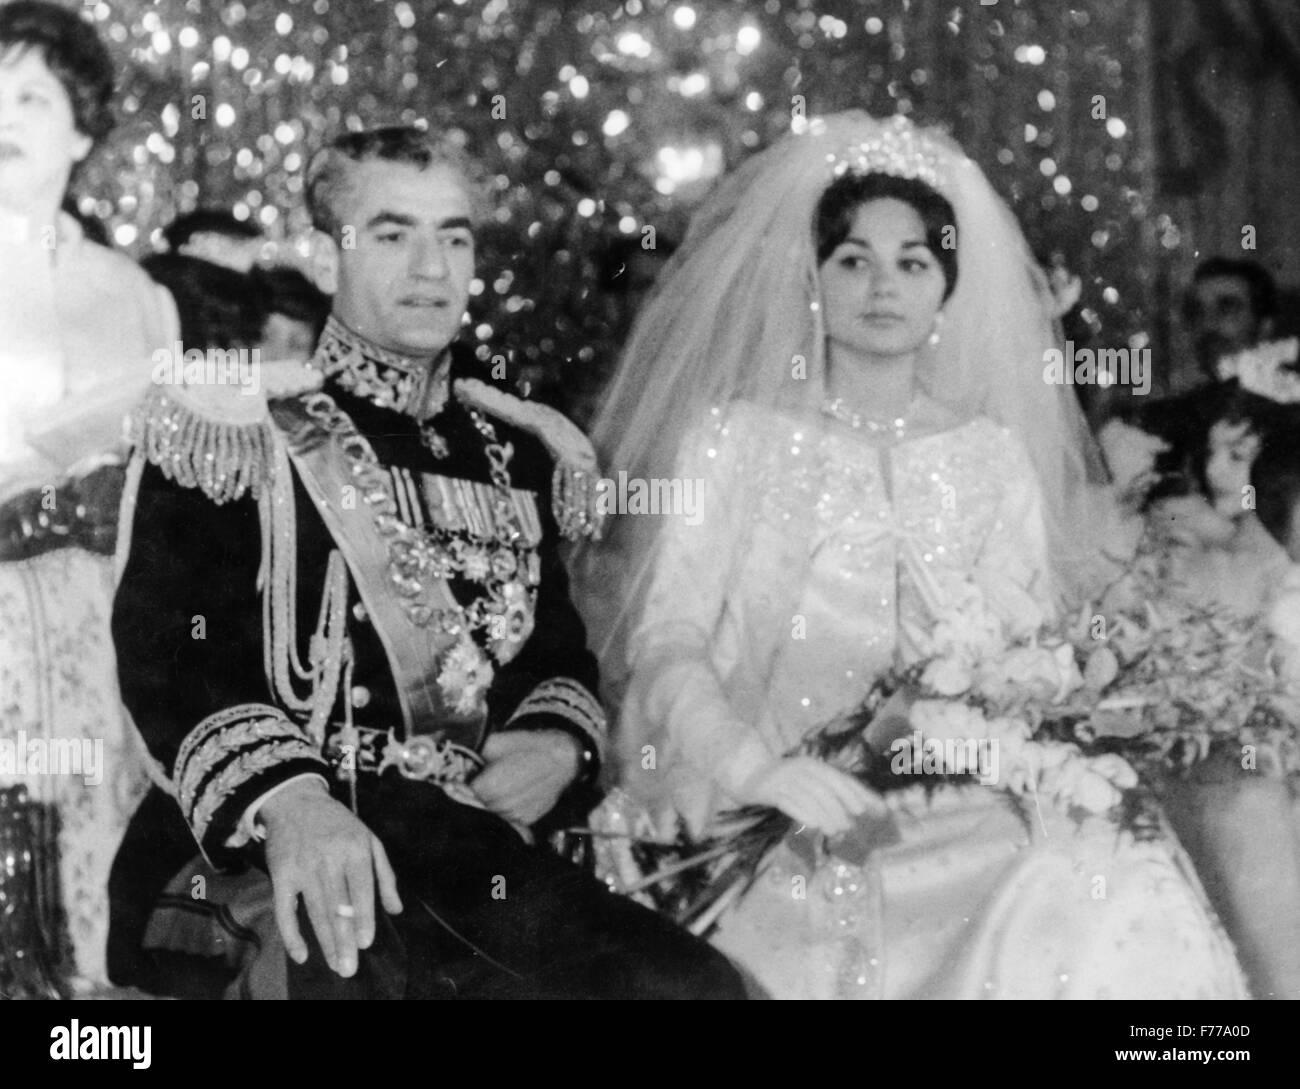 wedding of Mohammed Reza Pahlavi and Farah Diba,tehran,iran